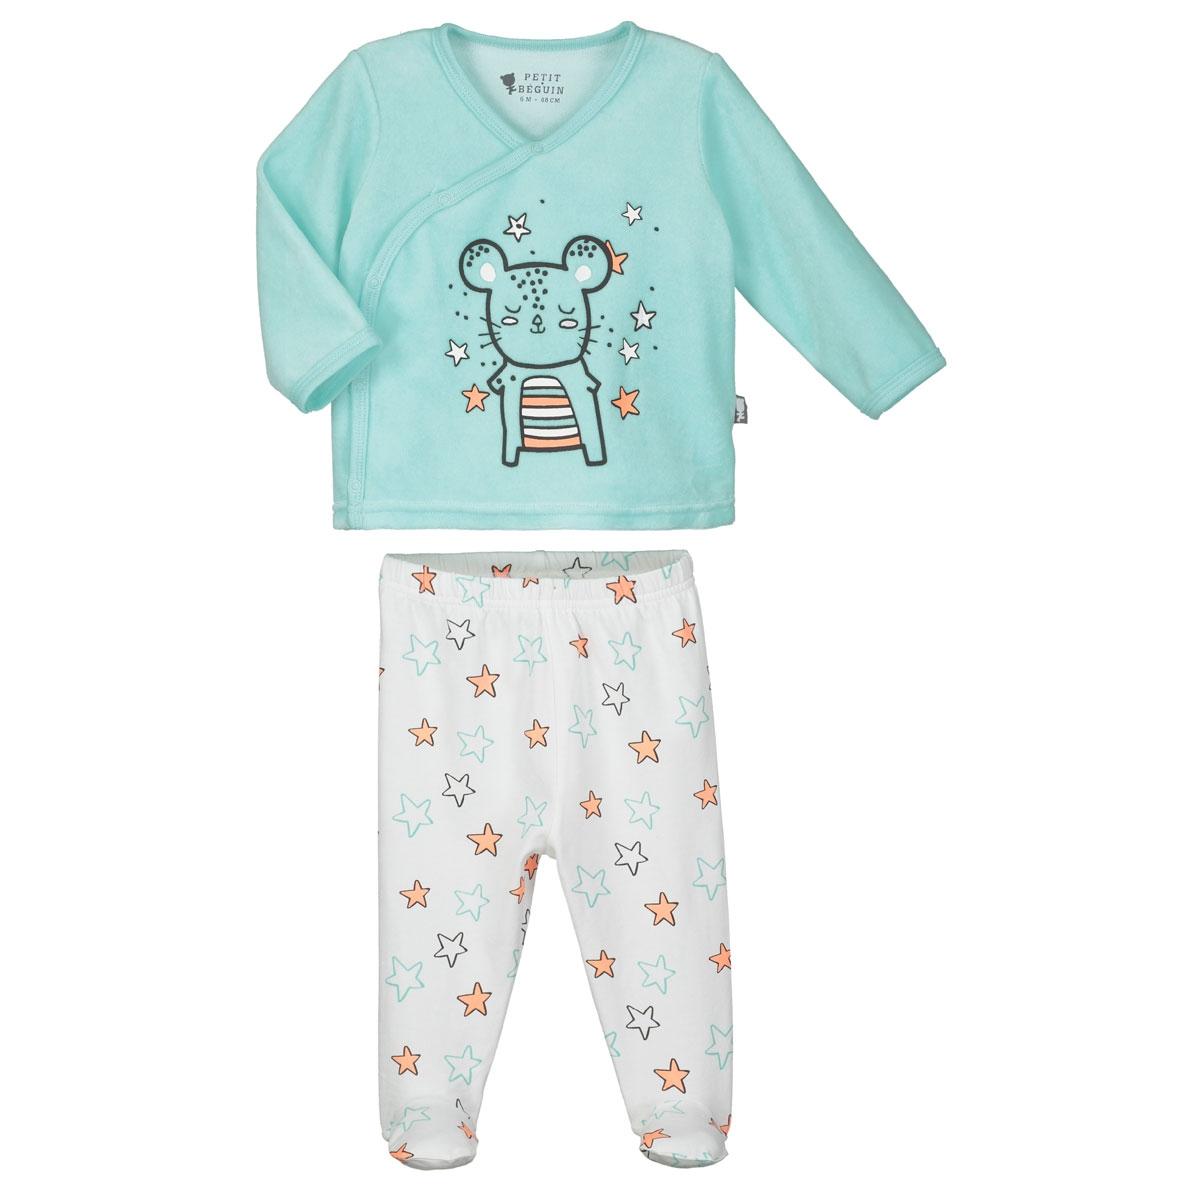 33a51ff5f6267 Pyjama bébé 2 pièces Lapinou - PETIT BEGUIN